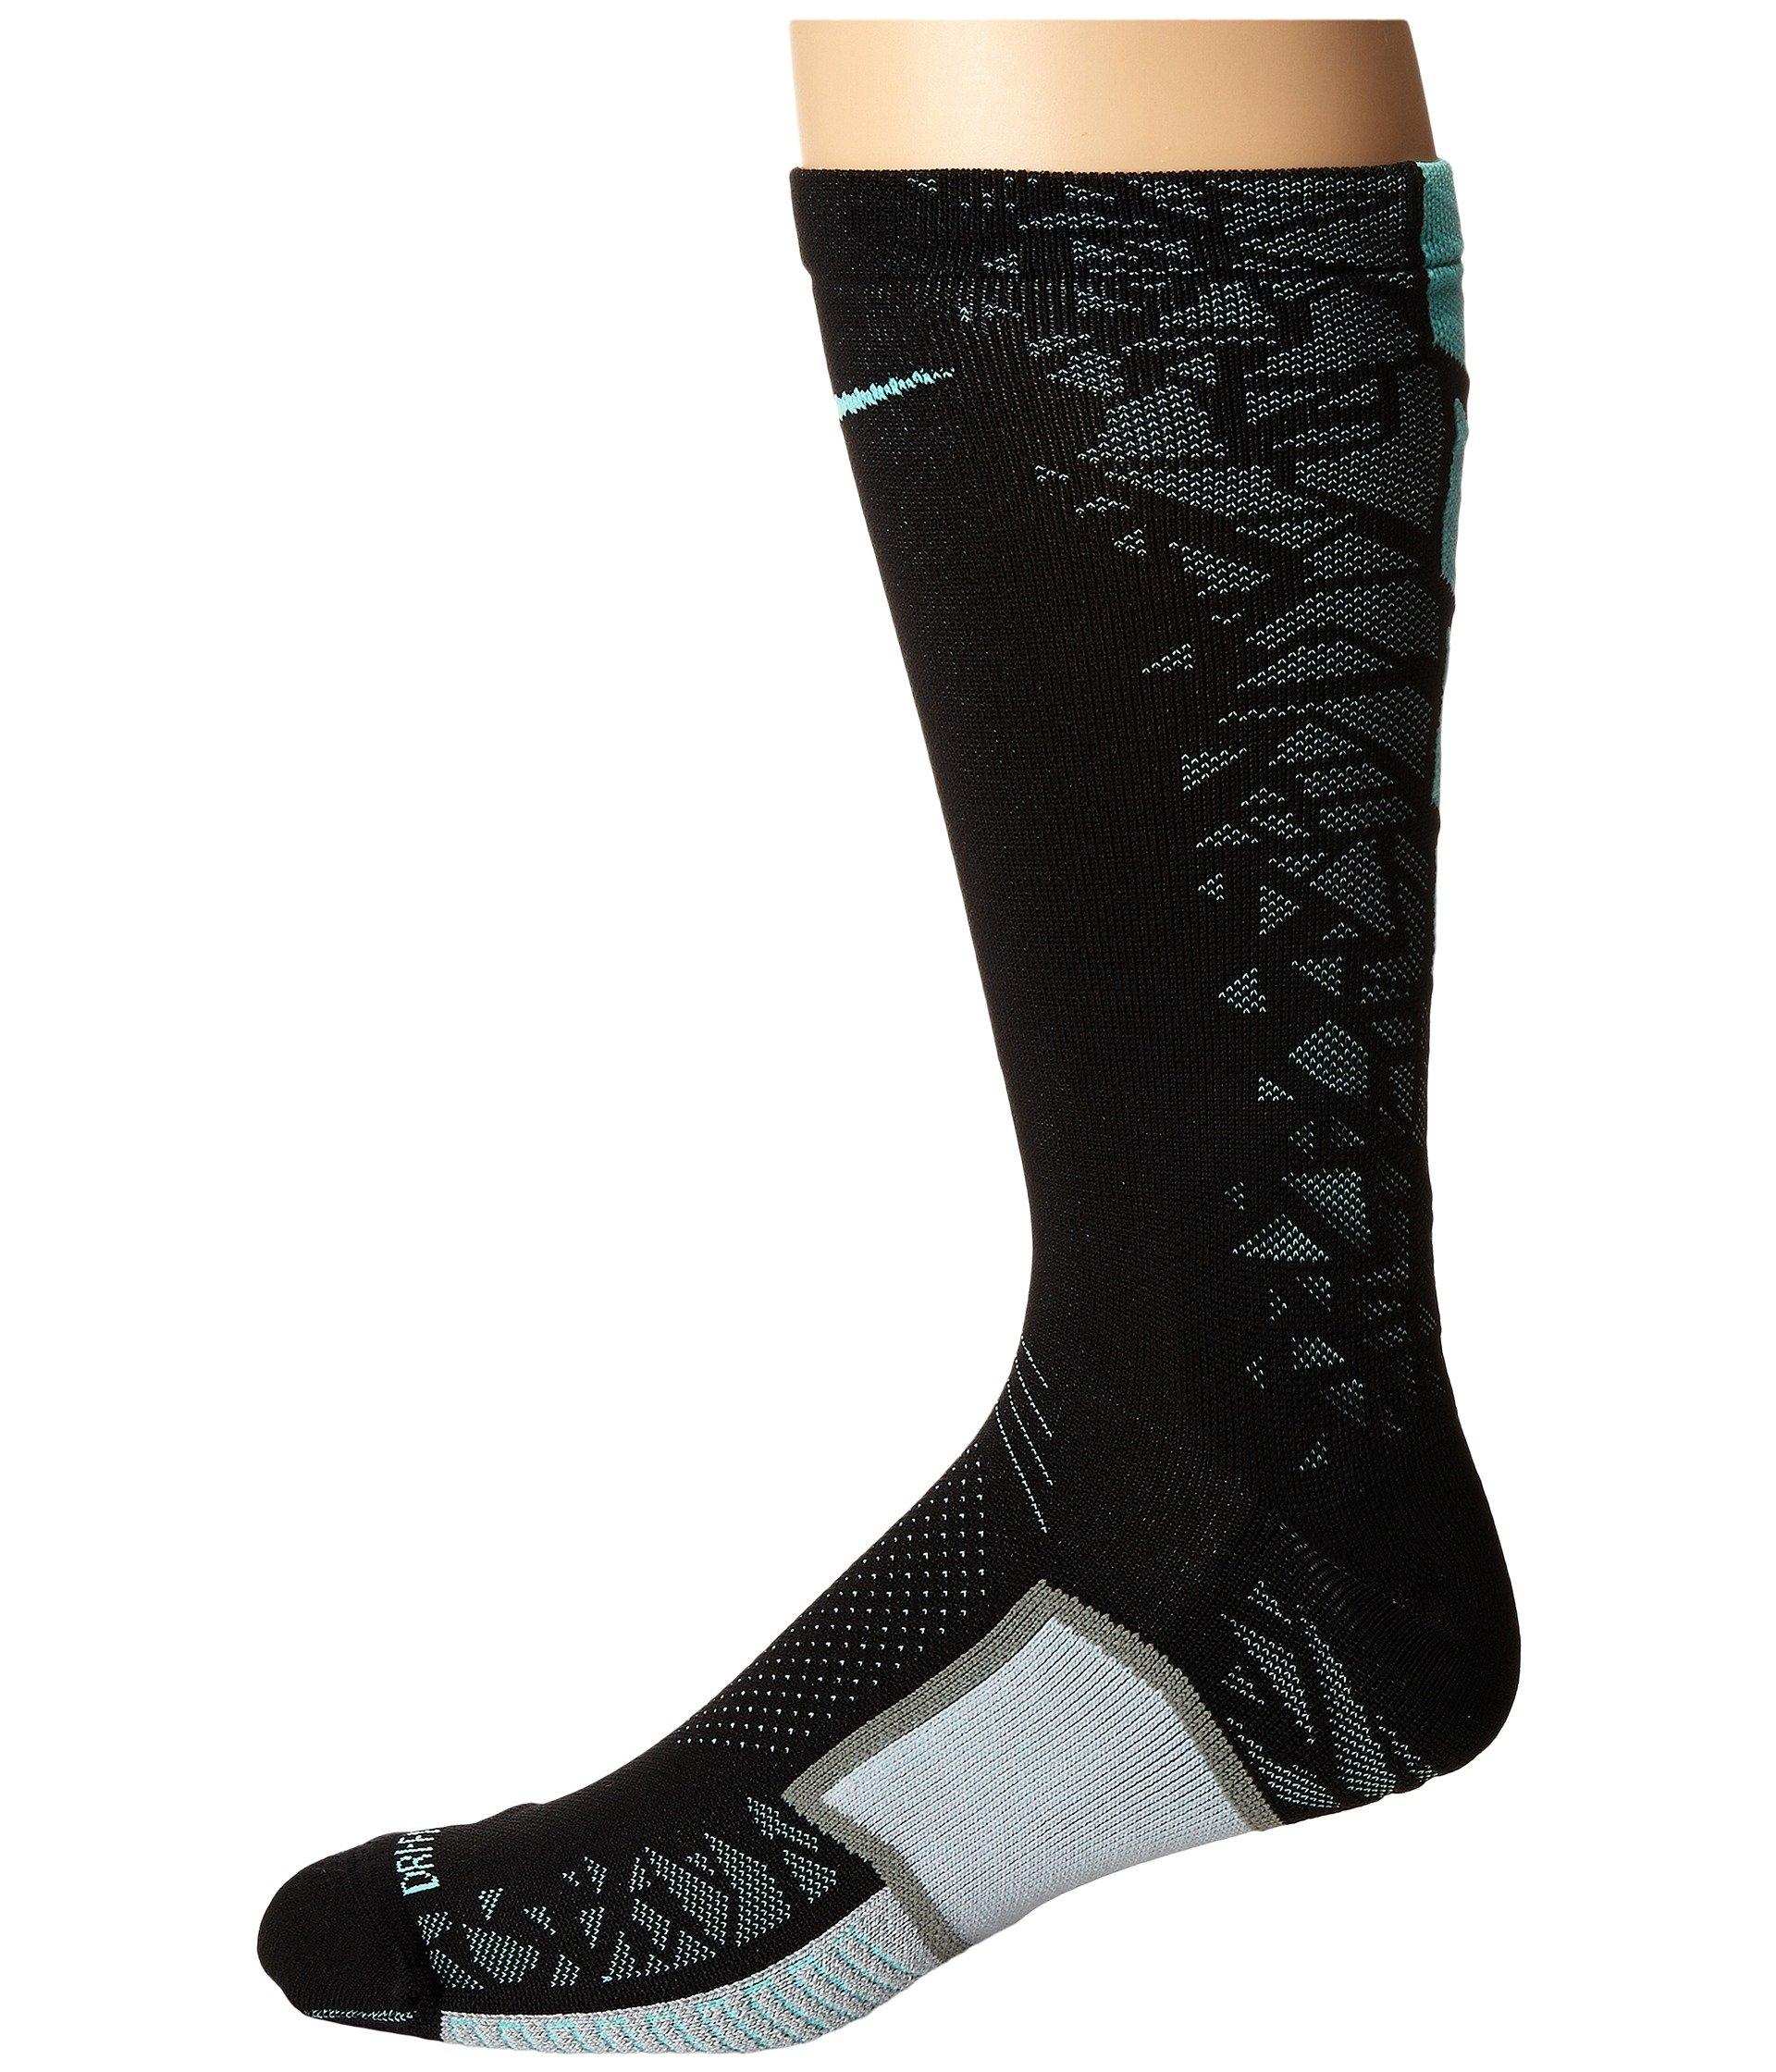 6a4a6f735 Nike Matchfit Elite Hypervenom, Black/Hyper Turquoise/Hyper Turquoise